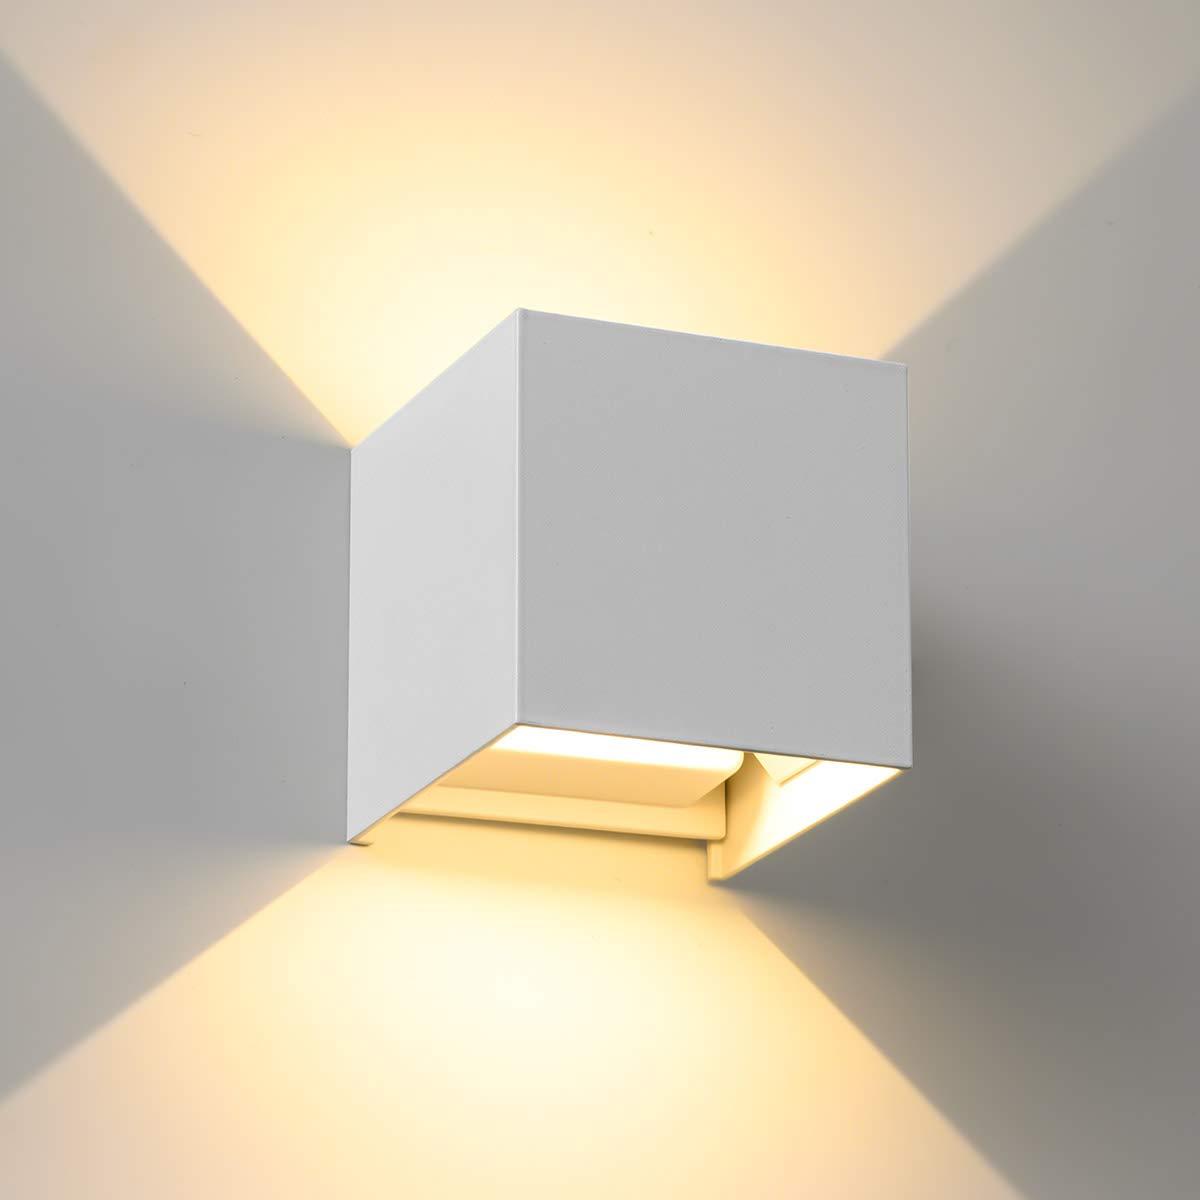 schwarz LED Wandleuchte SEALIGHT Wandlampe 7W Wandbeleuchtung IP 67 Lampe Beleuchtung 3000K Warmwei/ß Licht f/ür Innen und Au/ßenbeleuchtung Wohnzimmer Schlafzimmer Treppenhaus Flur